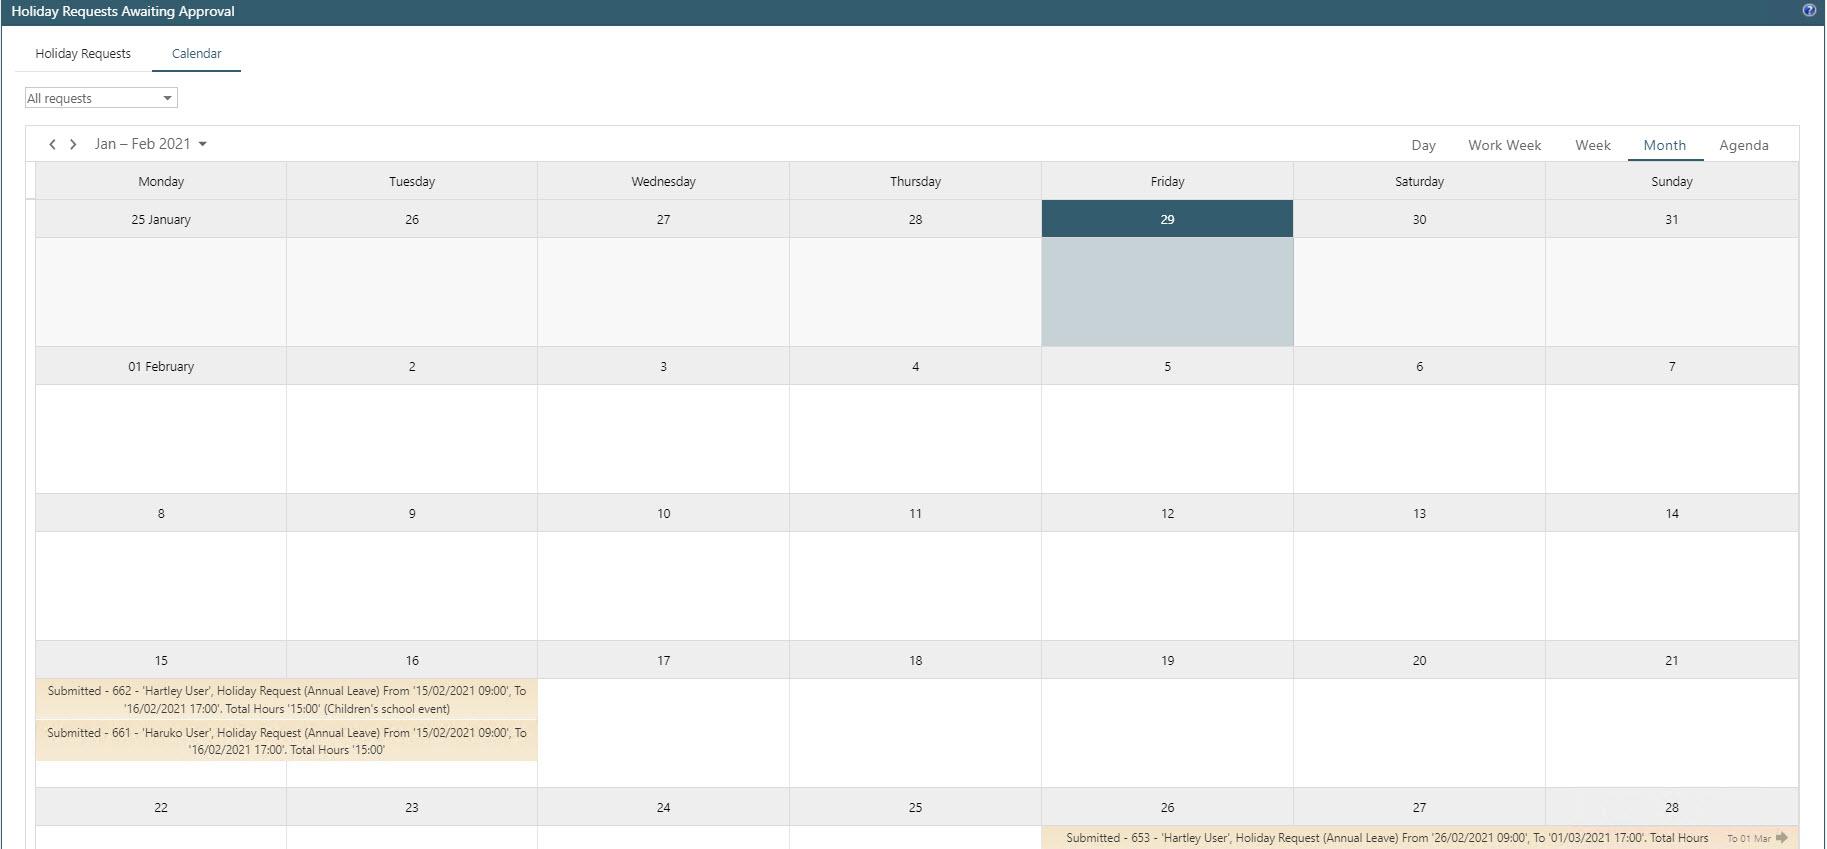 Sicon WAP Holidays Help and User Guide - WAP Holidays HUG Section 13.5 - Image 1